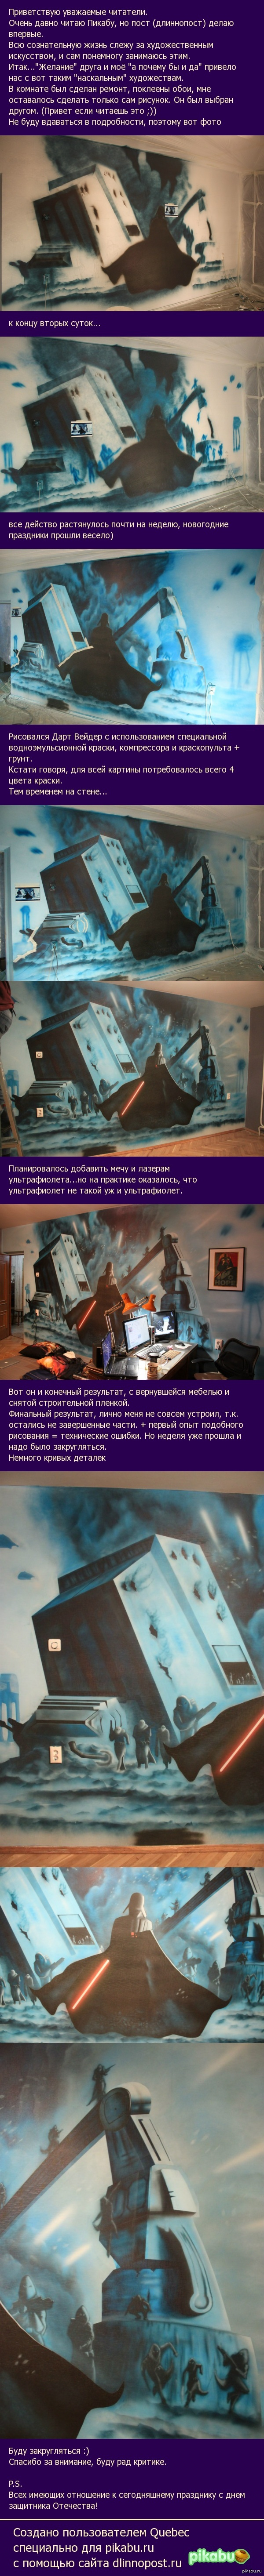 Some Star Wars Art Длиннопост о граффити в квартире друга, Дарт Вейдер одобряе.